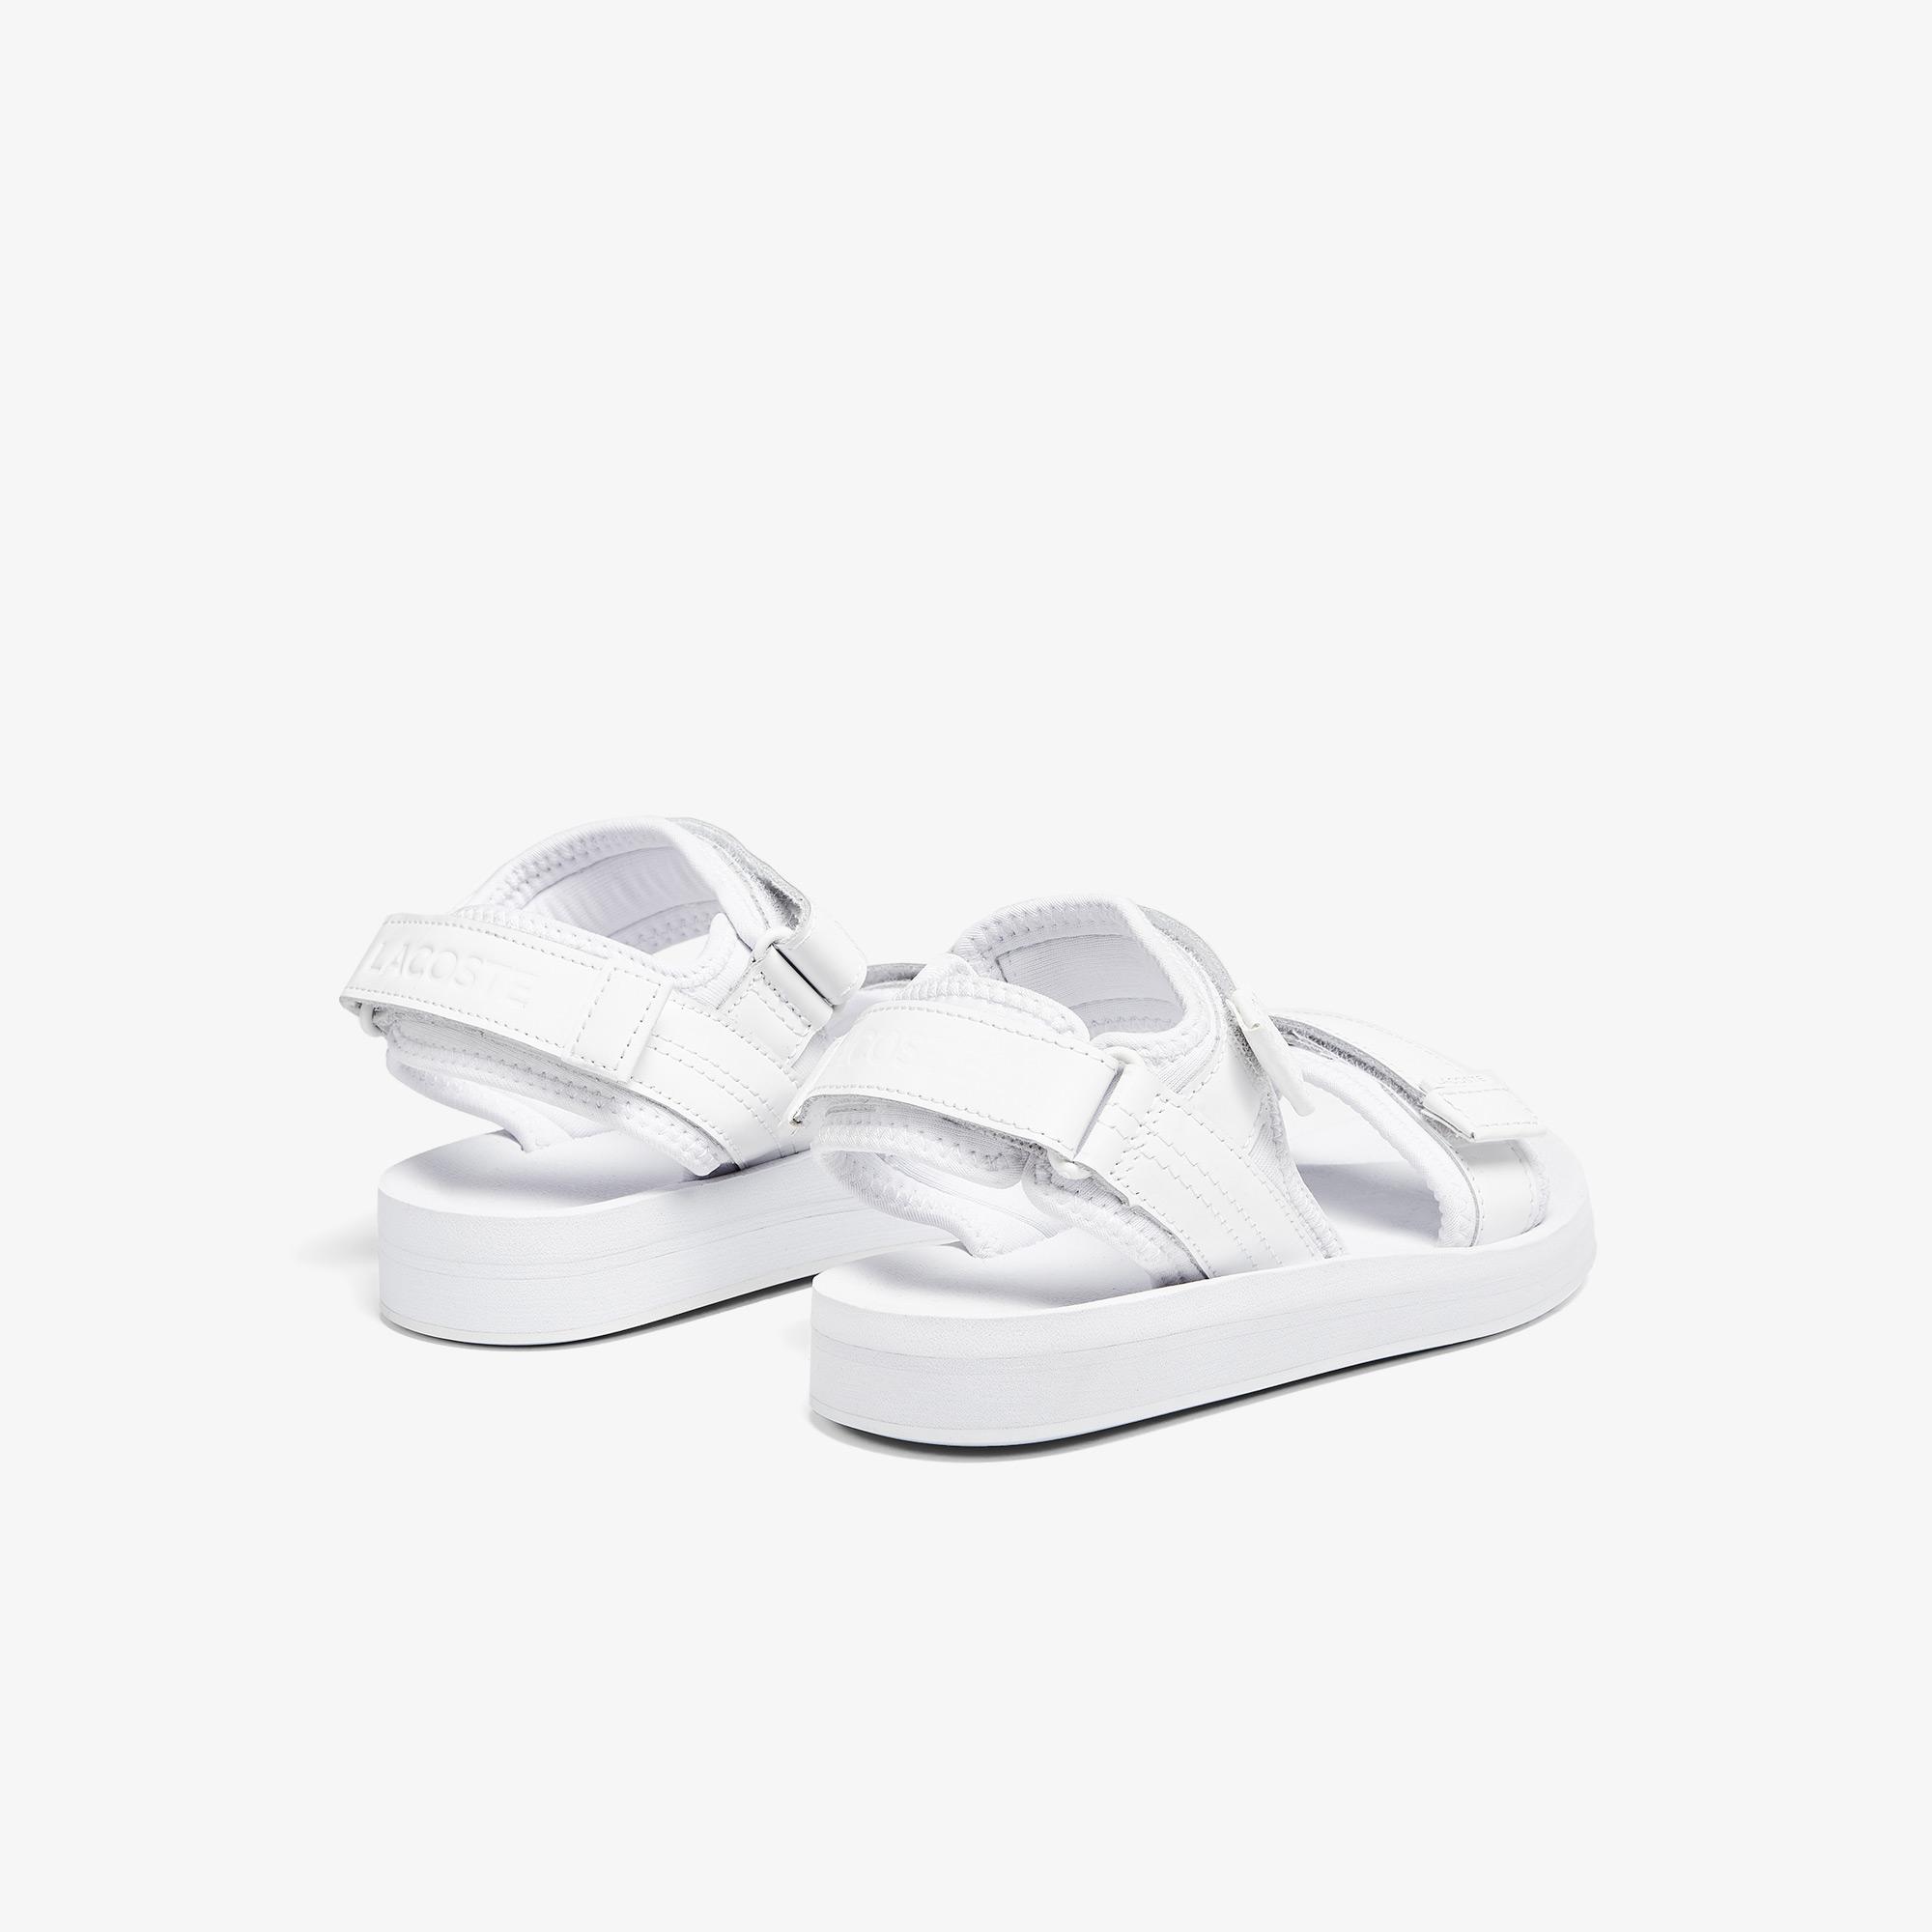 Lacoste Women's Suruga 0921 2 Cfa Shoes